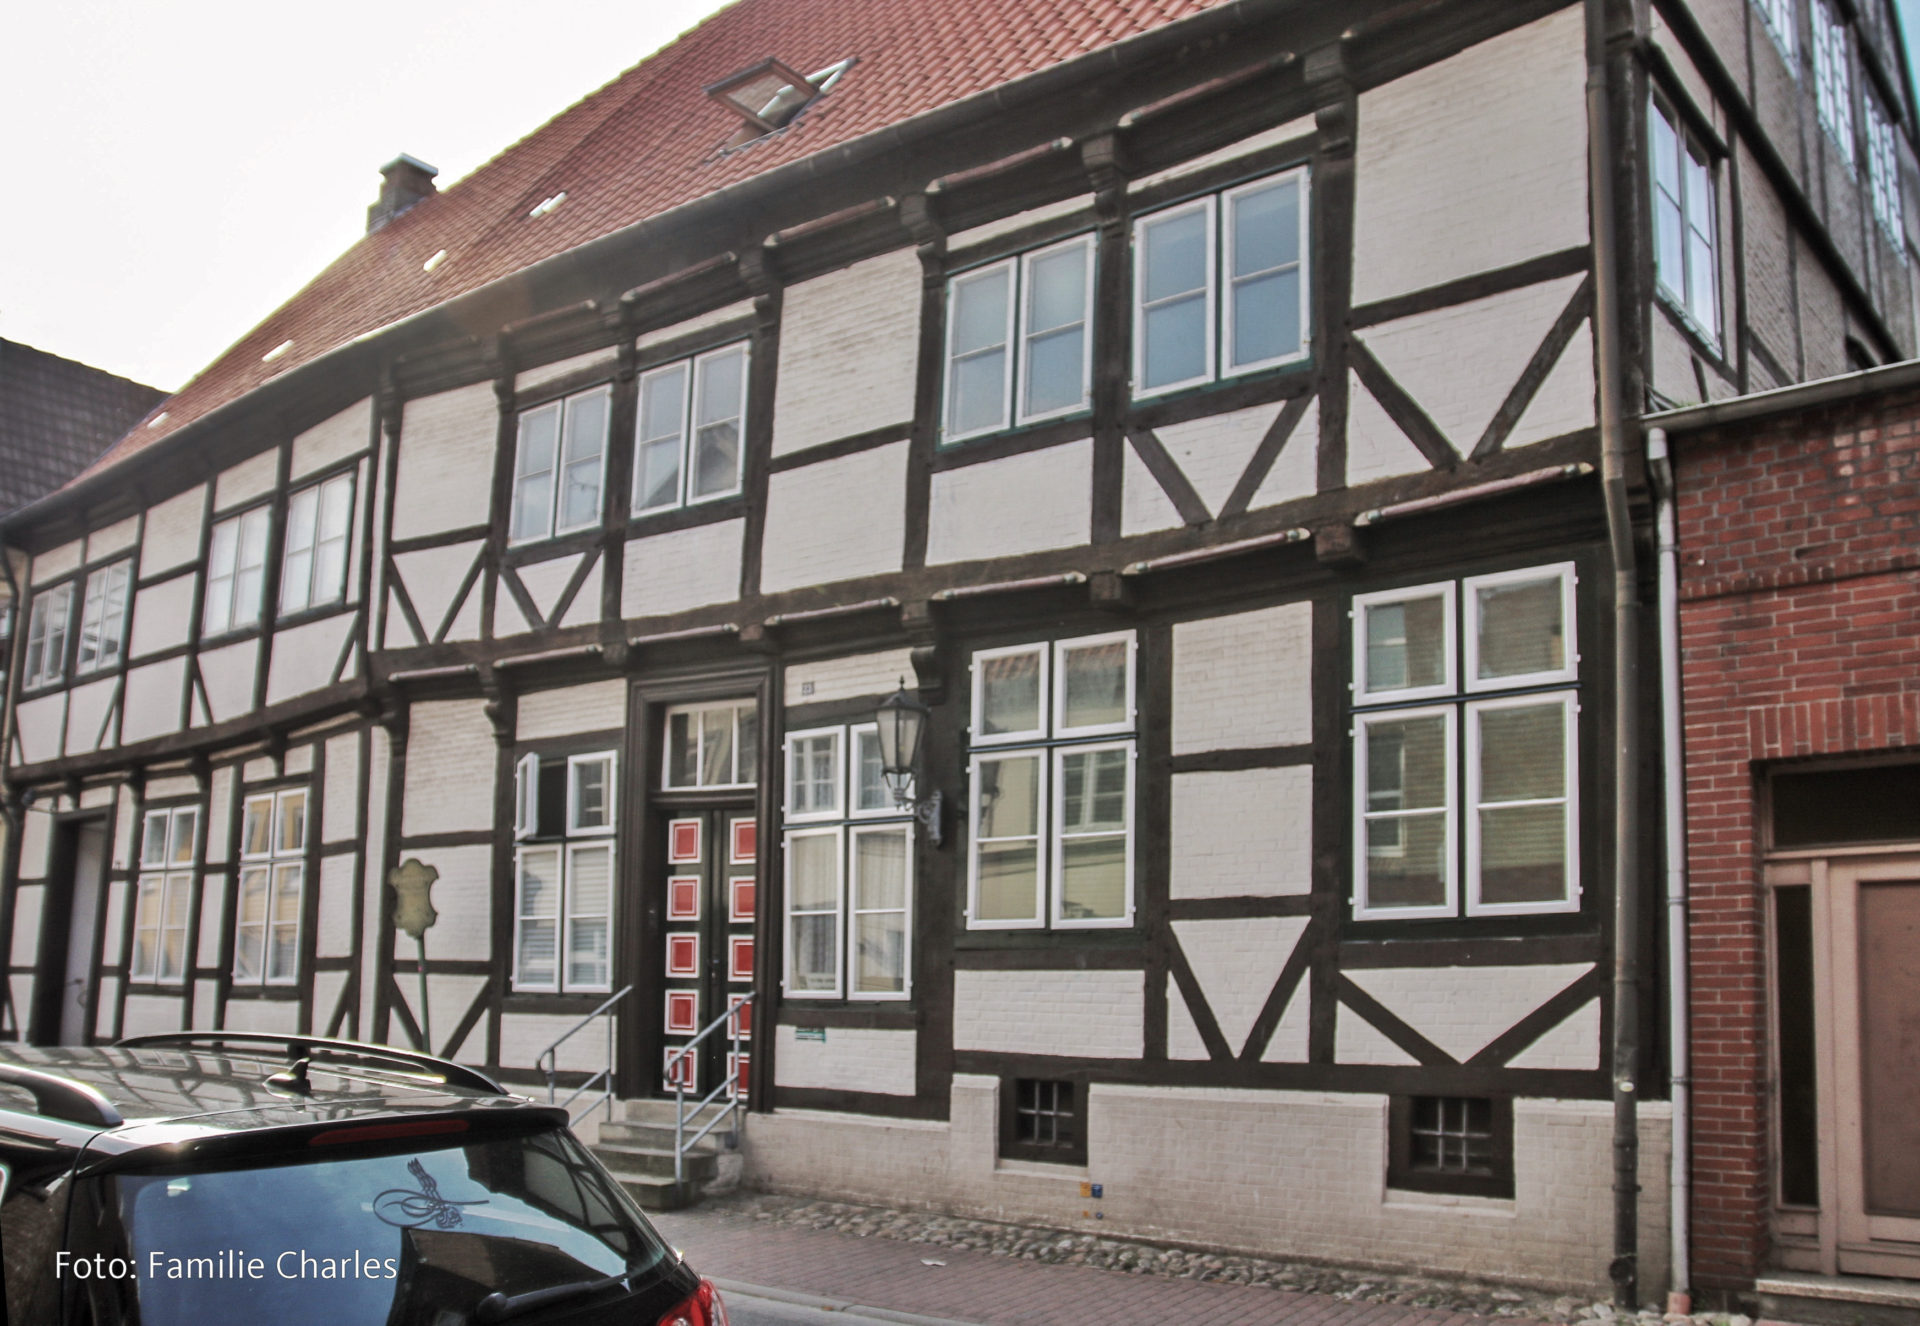 Glückstadtpalais - Foto: Familie Charles